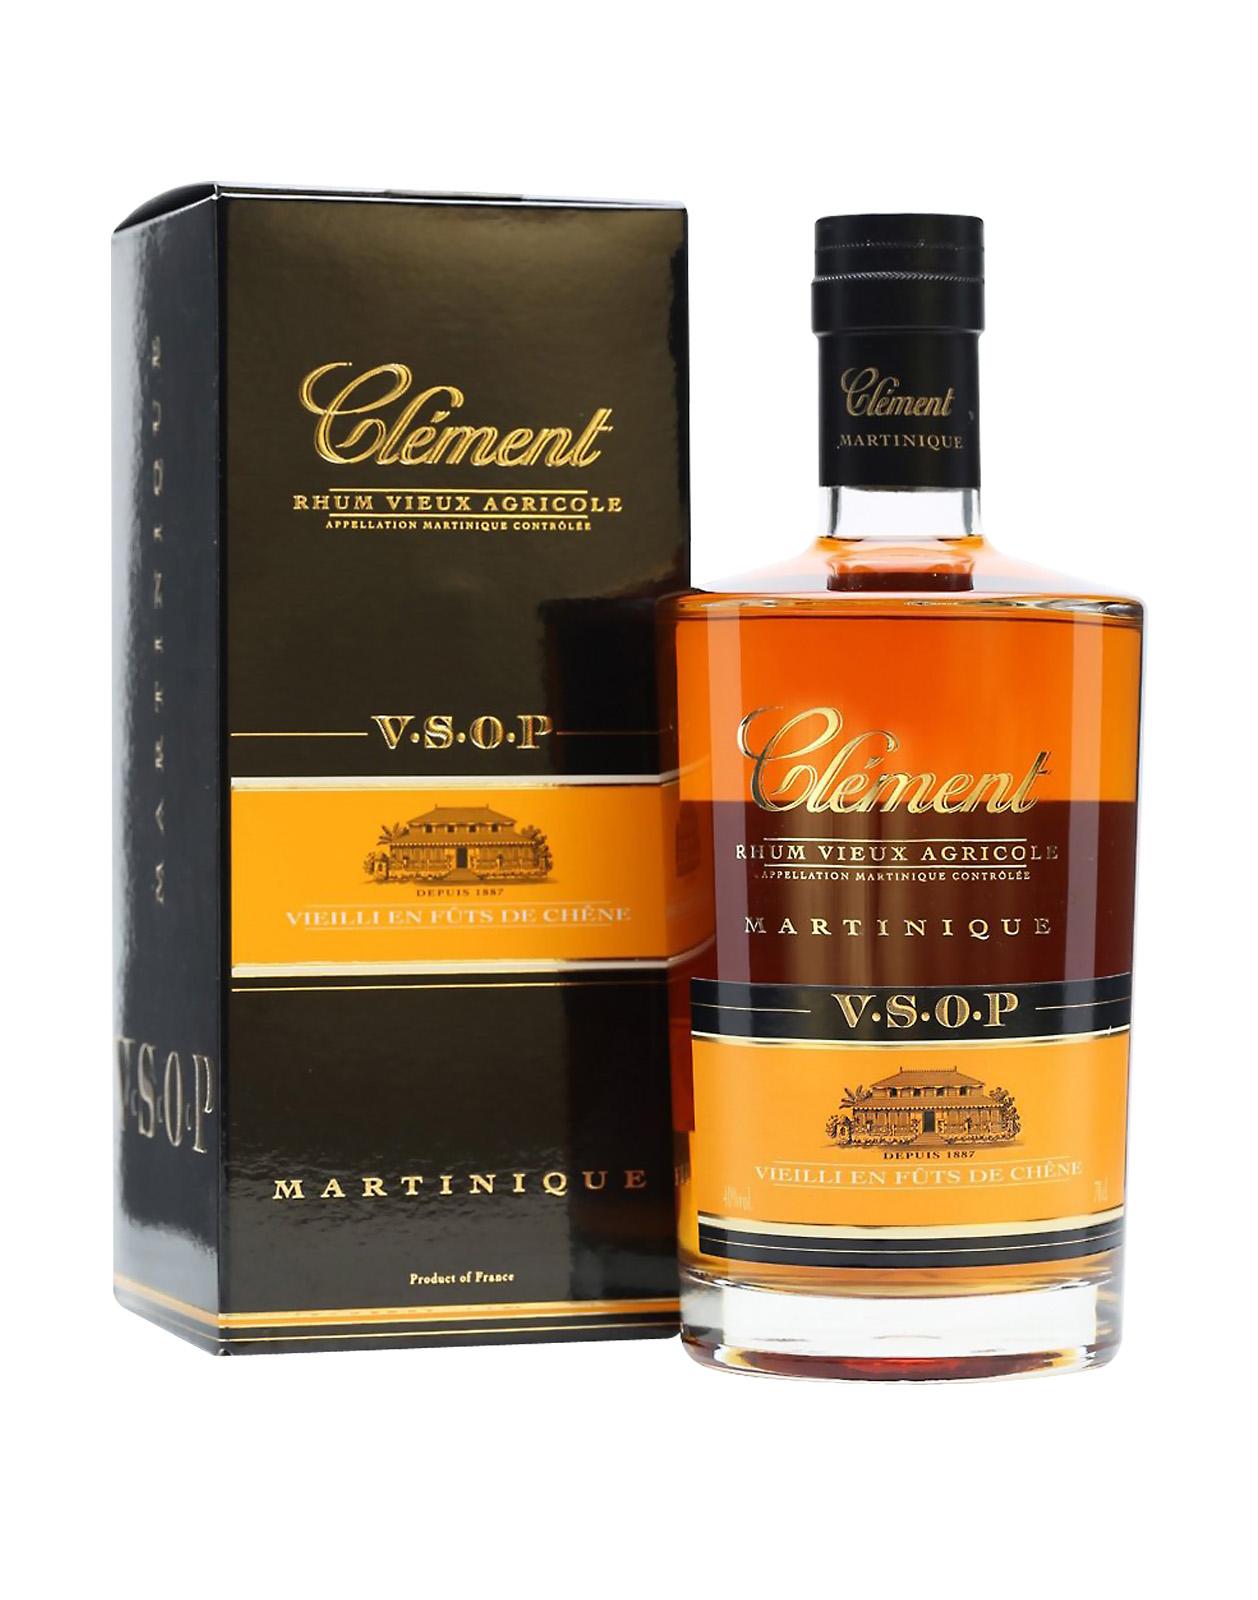 Clément Rhum VSOP 0,7L 40% rum, Bottleshop Sunny wines slnecnice mesto, petrzalka, rum, rozvoz alkoholu, eshop